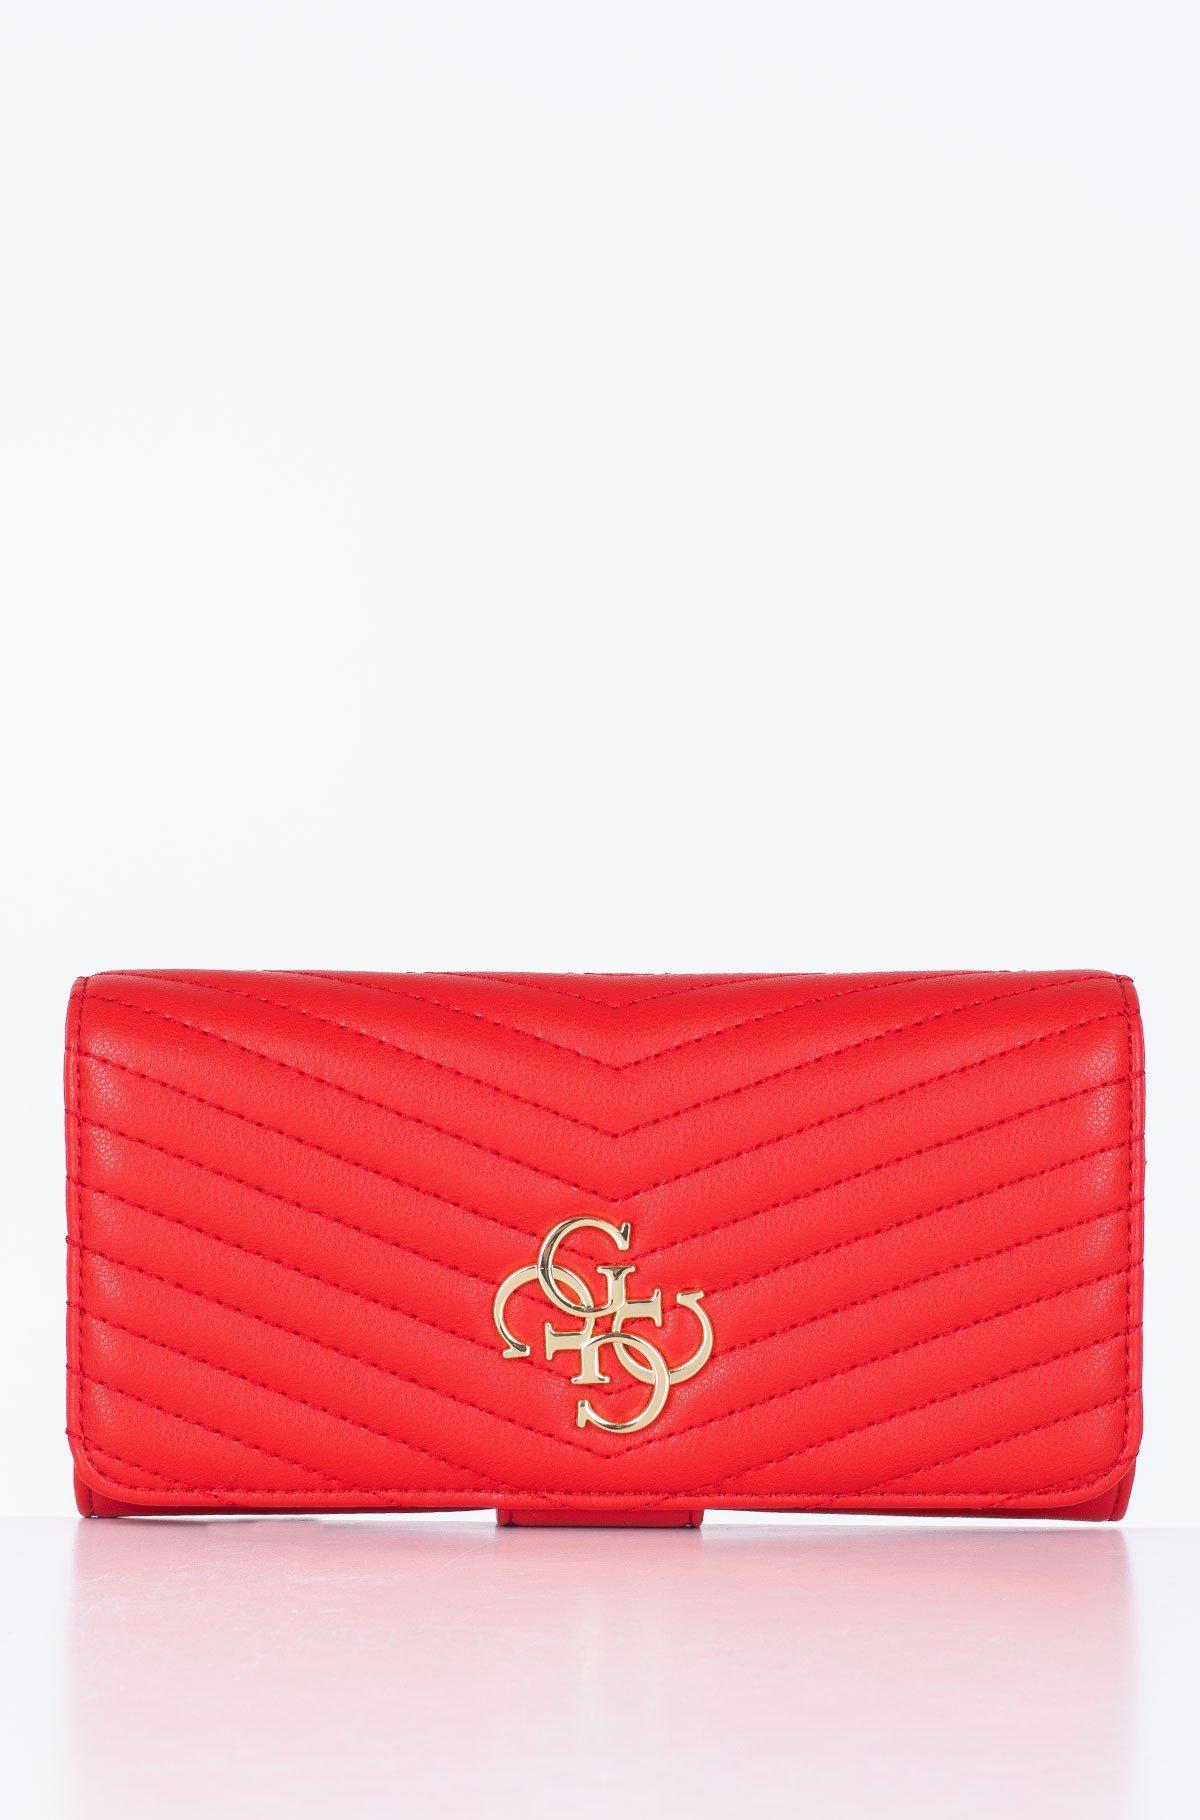 Wallet SWCORI P9459-full-1